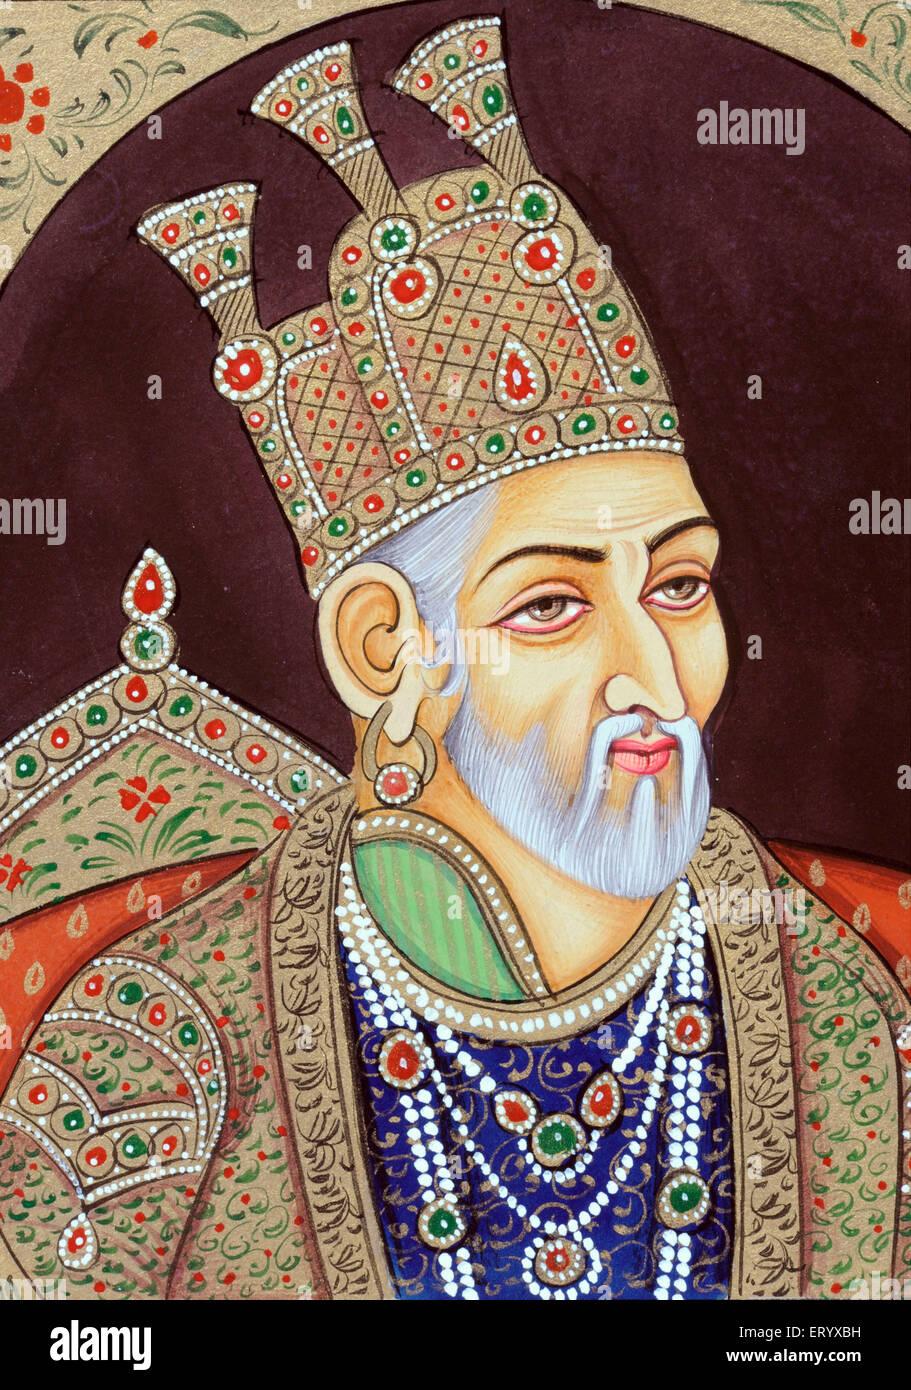 Mughal emperor bahadur shah zafar